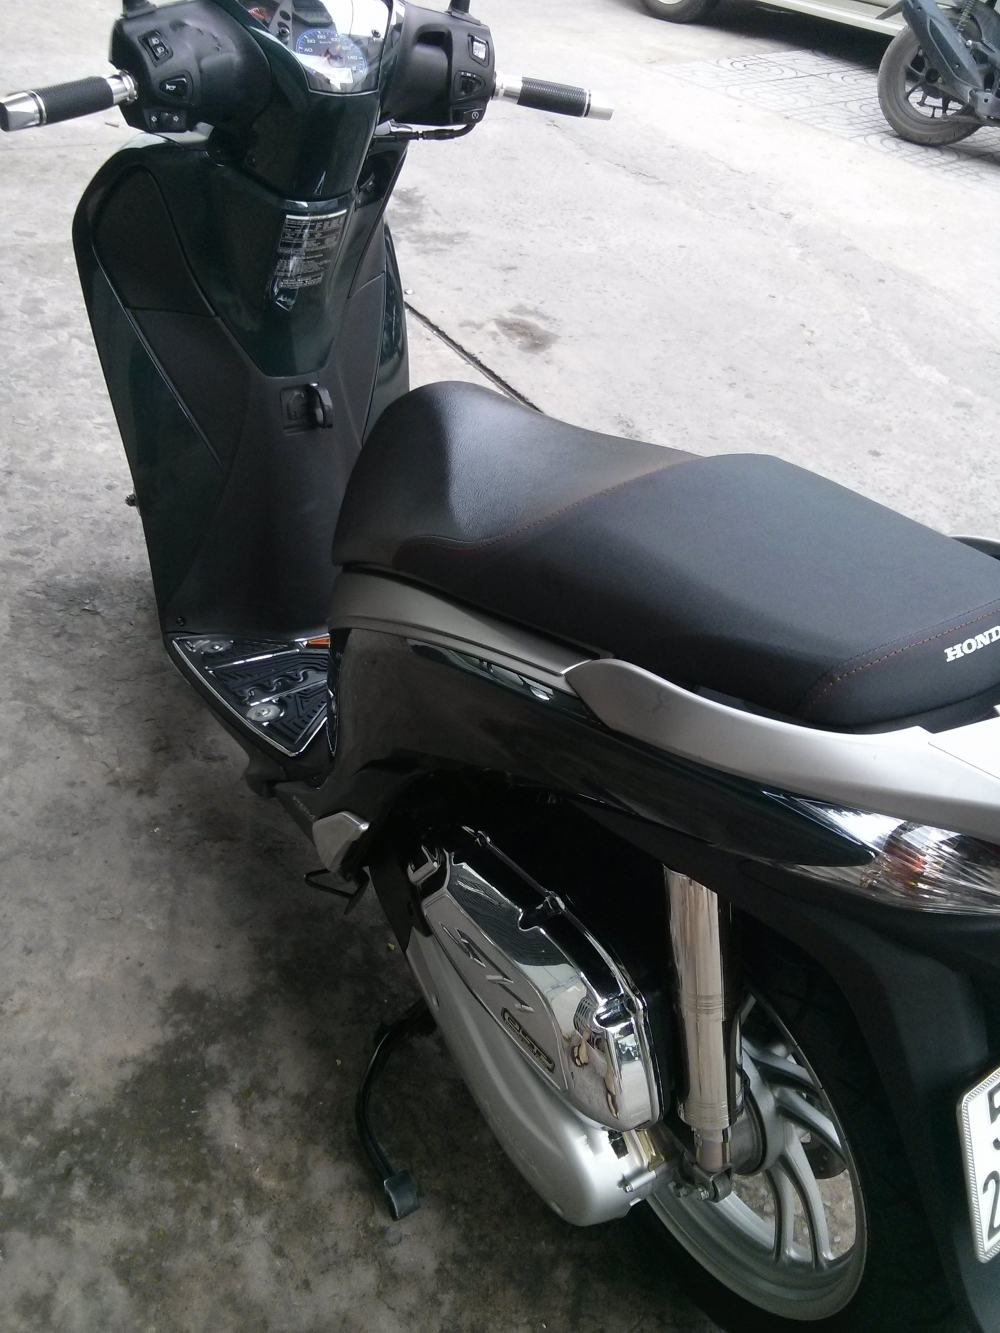 SH 150 Xanh Reu Smartkey 112016 - 2